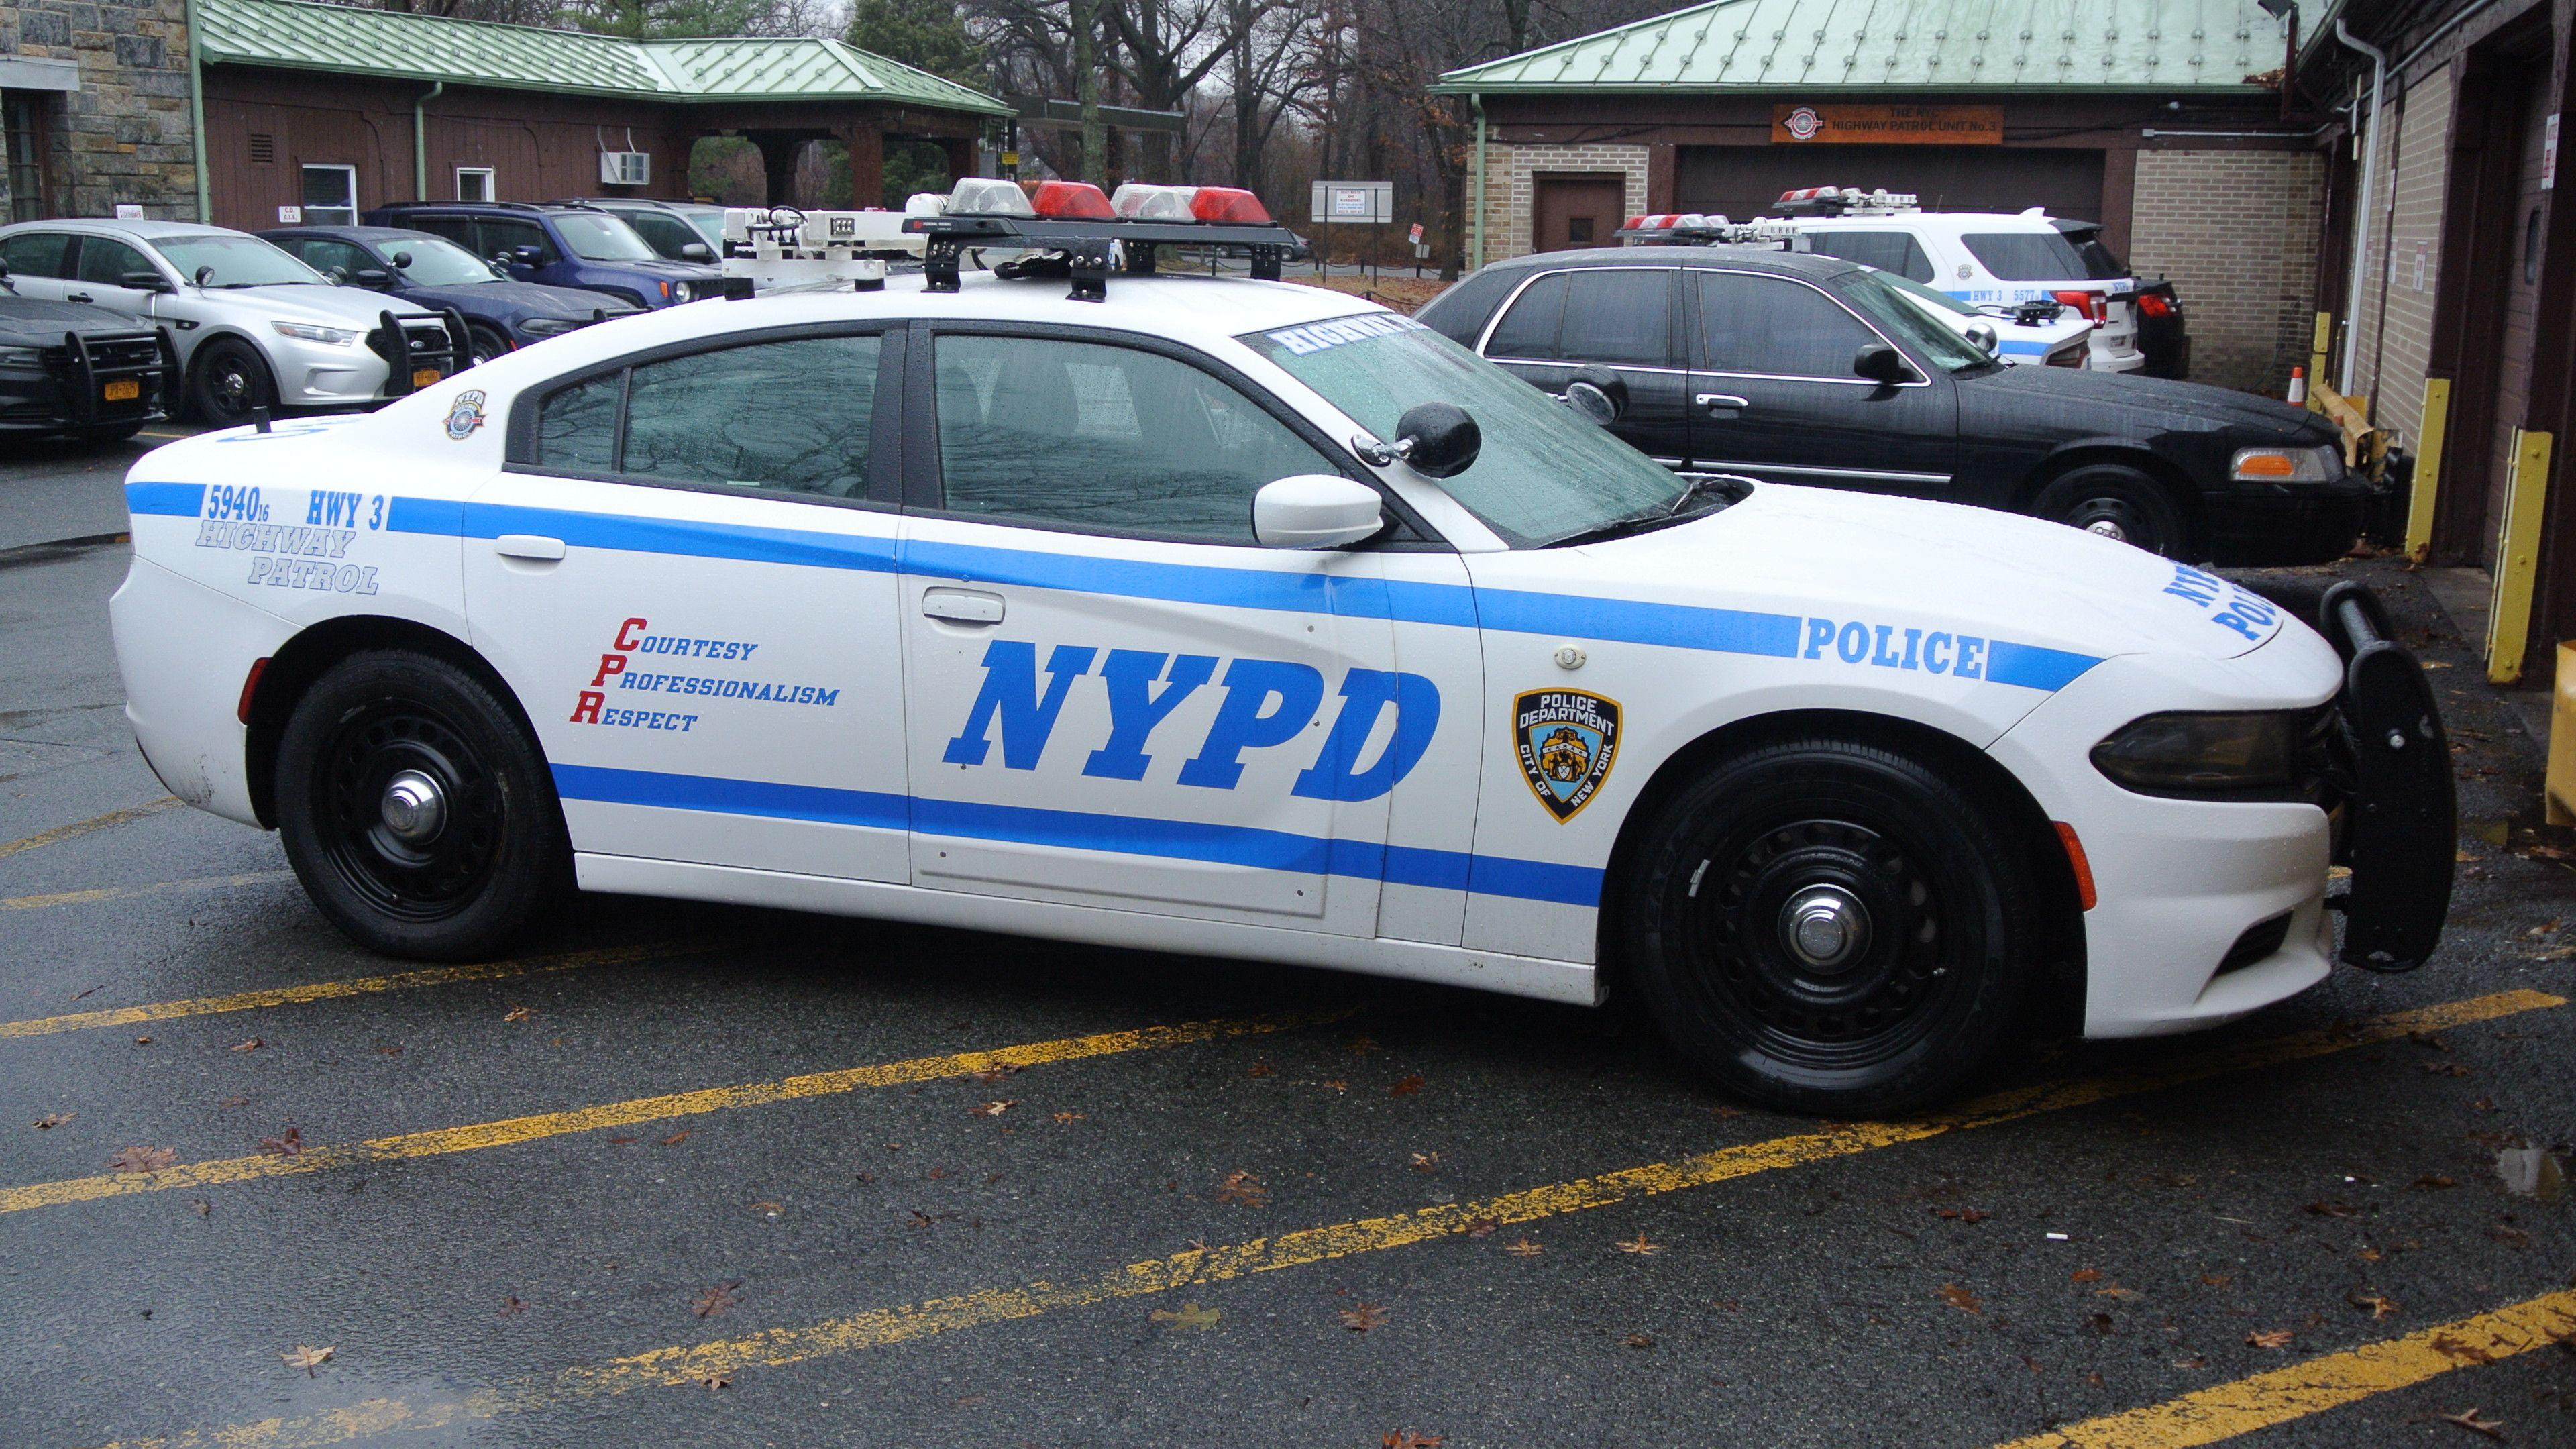 New York Police Department Highway Patrol Police New York Police Us Police Car